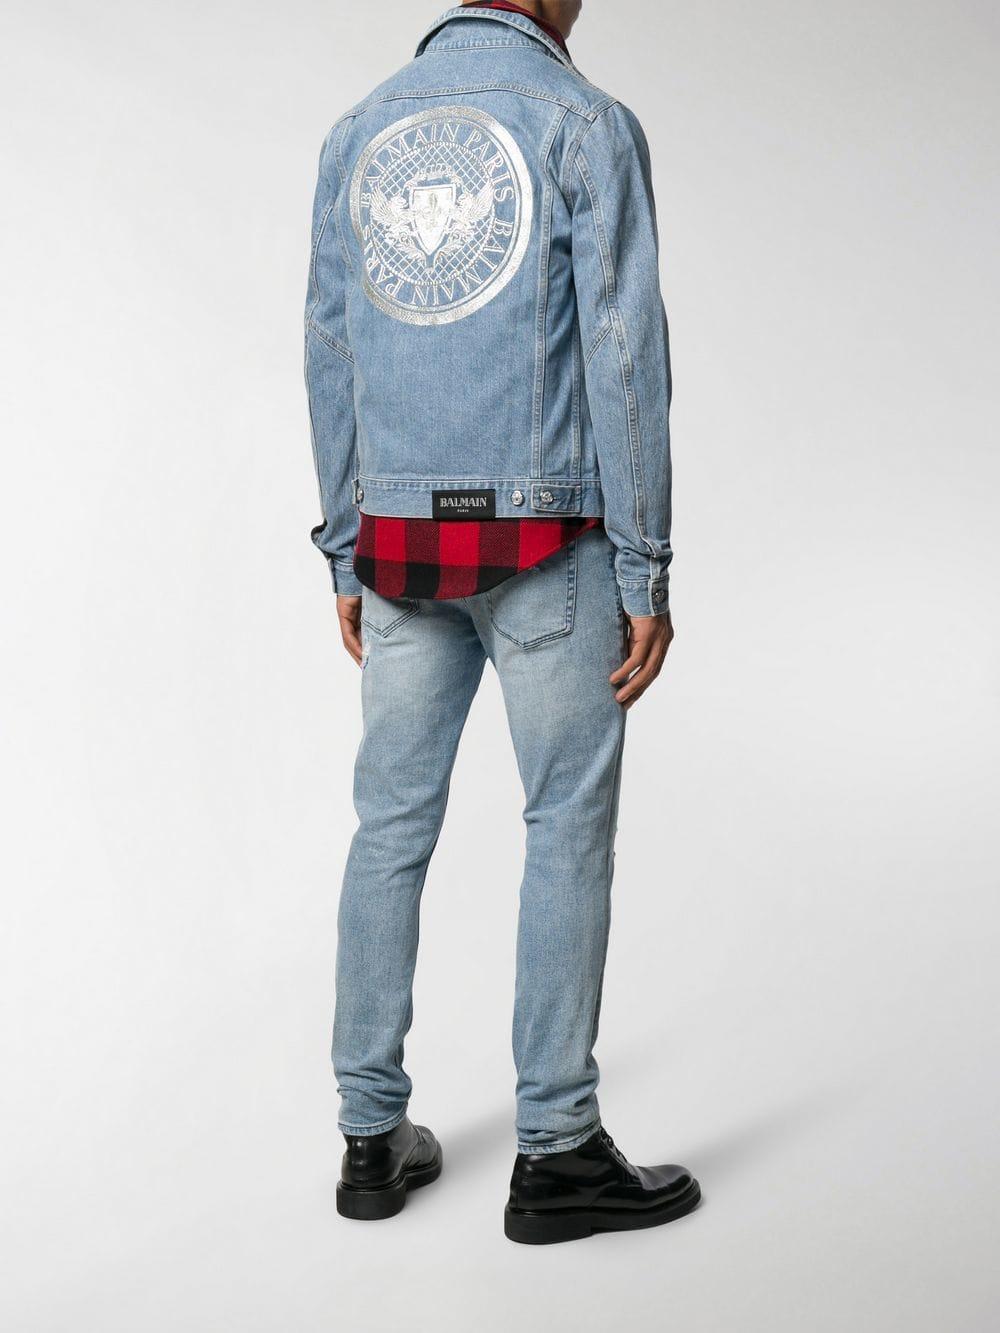 94015dd1 Lyst - Balmain Embroidered Logo Denim Jacket in Blue for Men